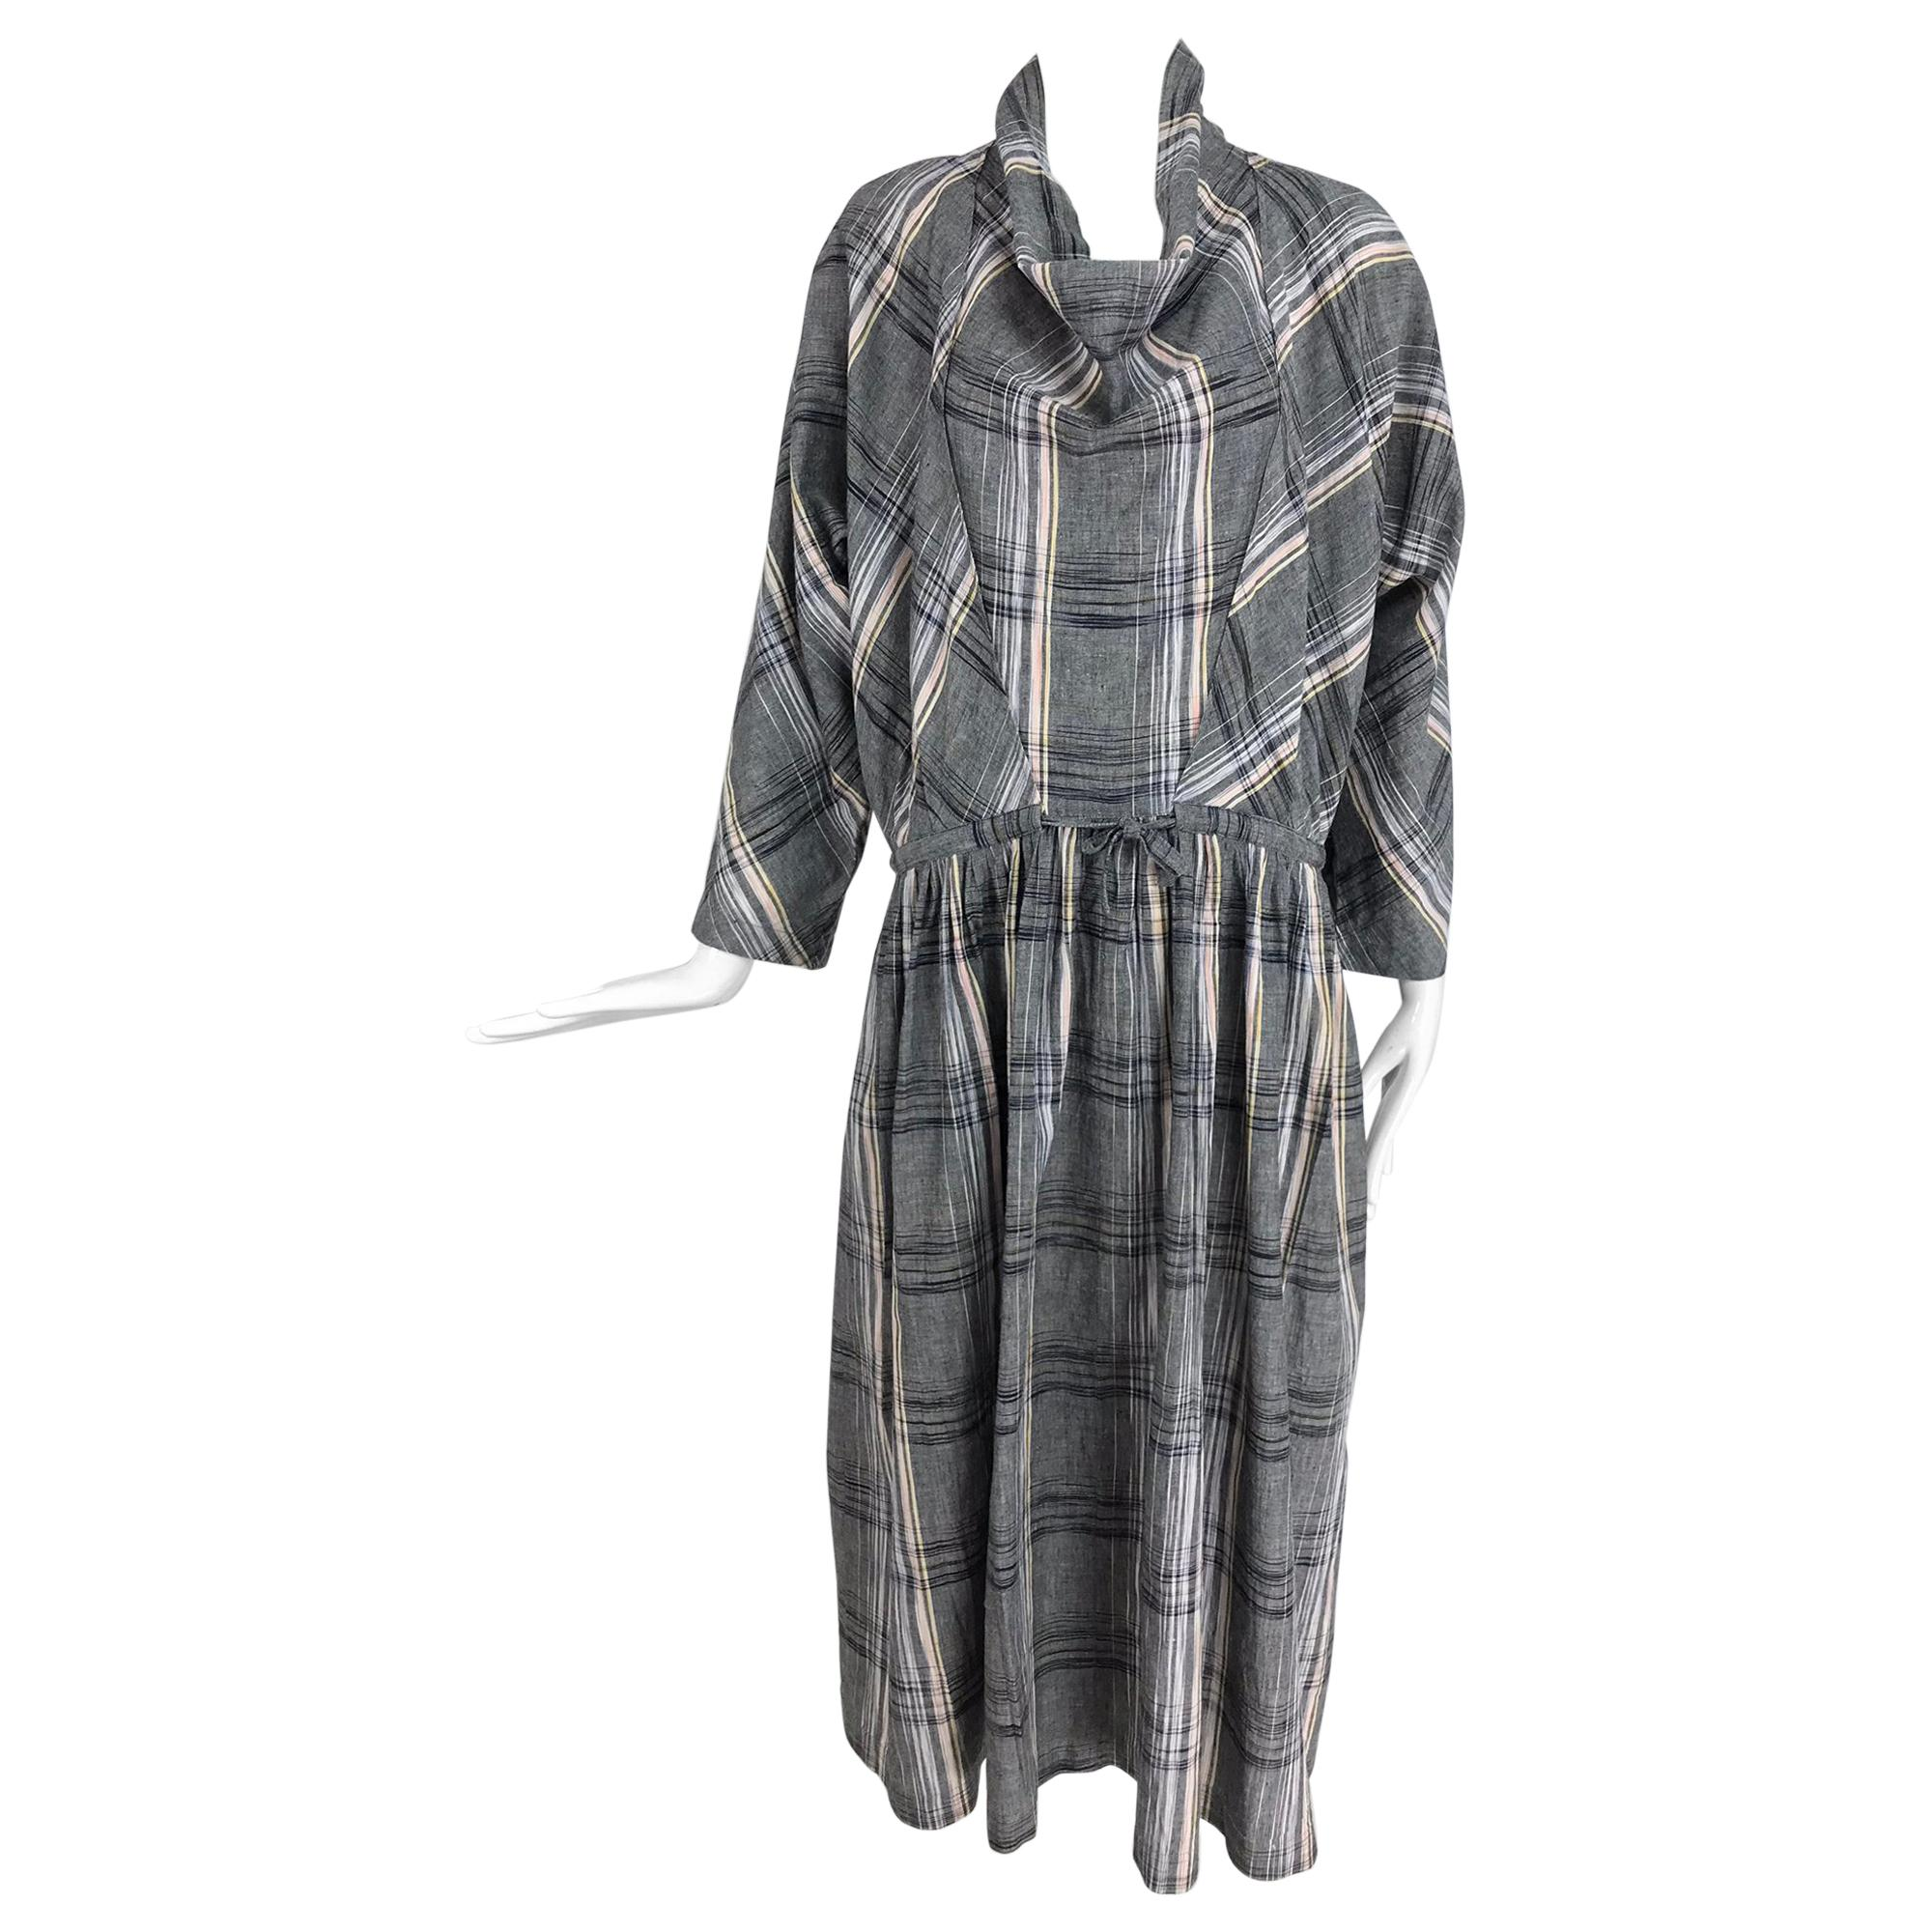 Issey Miyake Funnel Neck Plaid Cotton Draw Cord Waist Dress 1980s